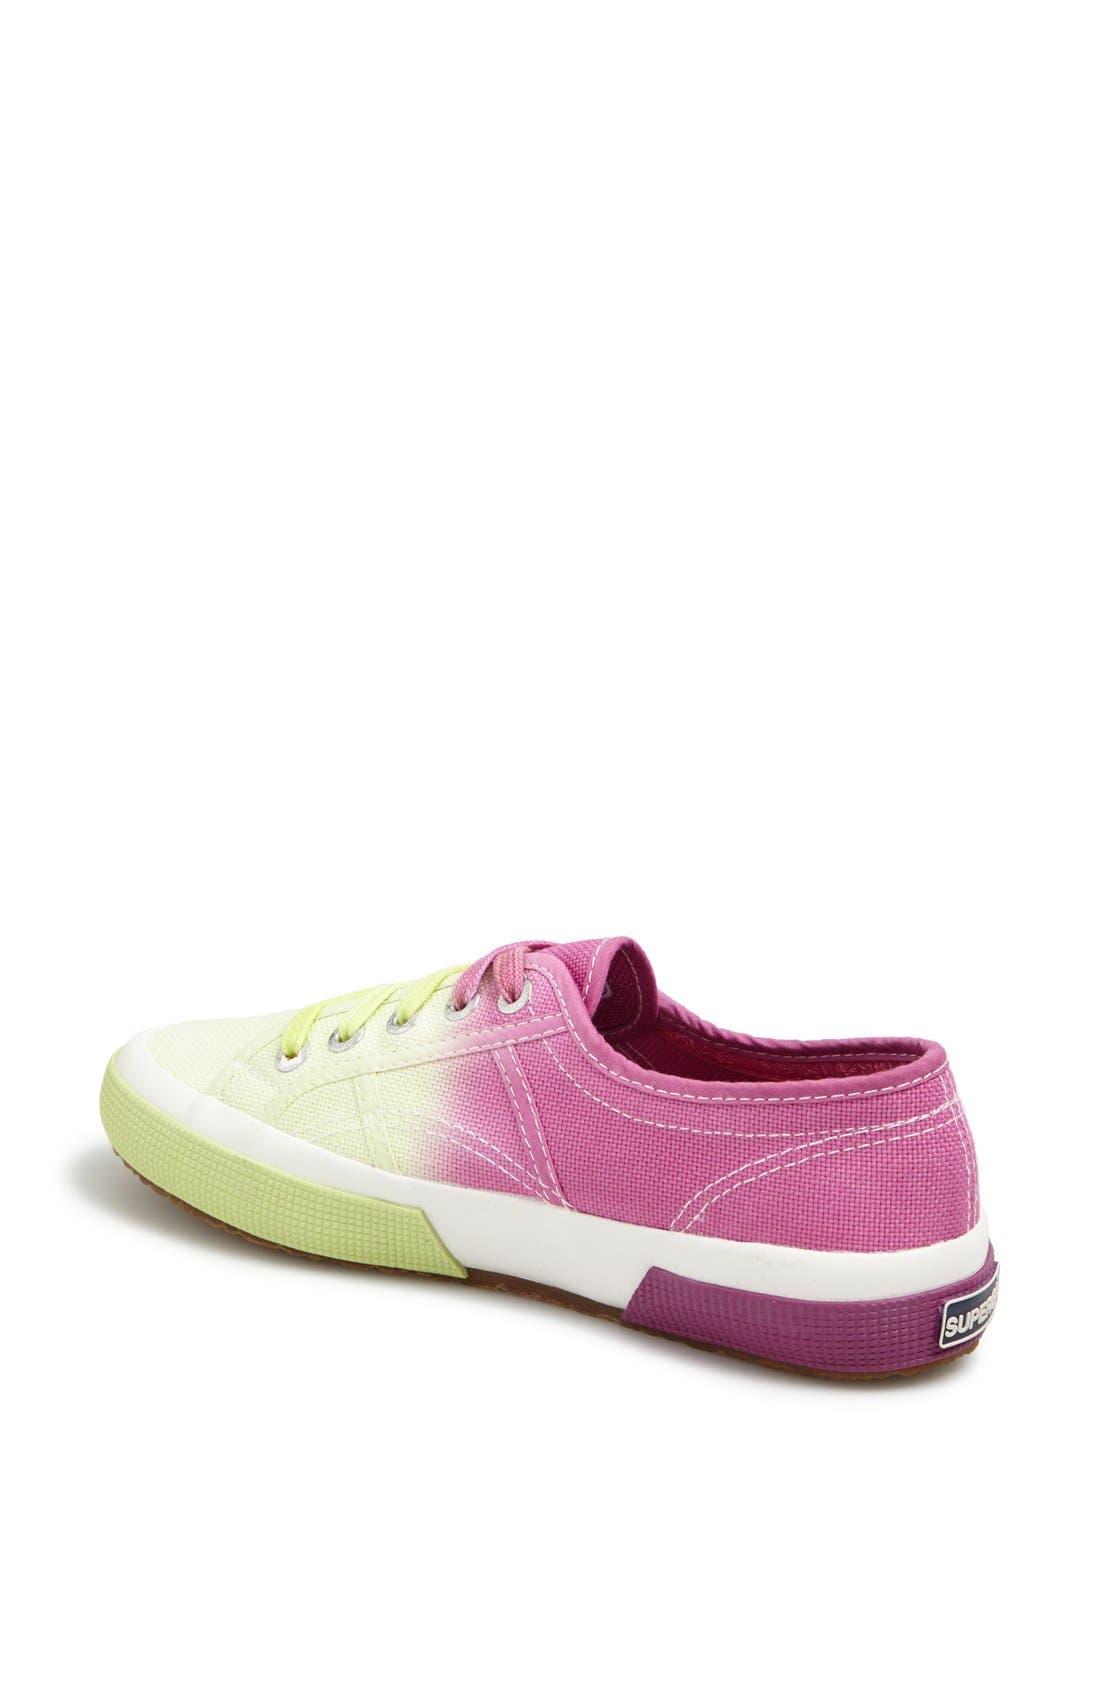 Alternate Image 2  - Superga 'Cotu - Shade' Sneaker (Women)